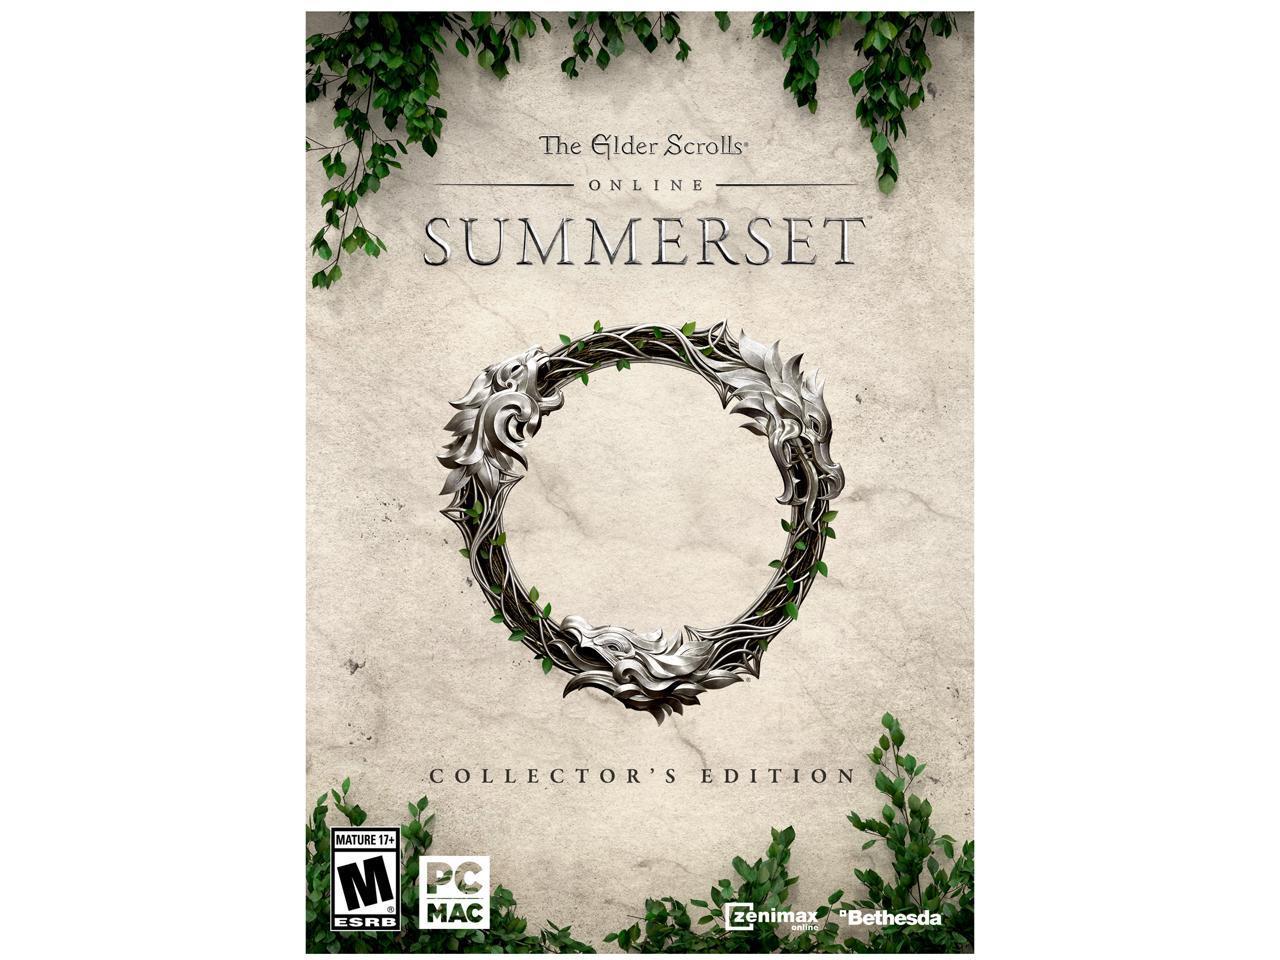 The Elder Scrolls Online: Summerset Collector's for PC